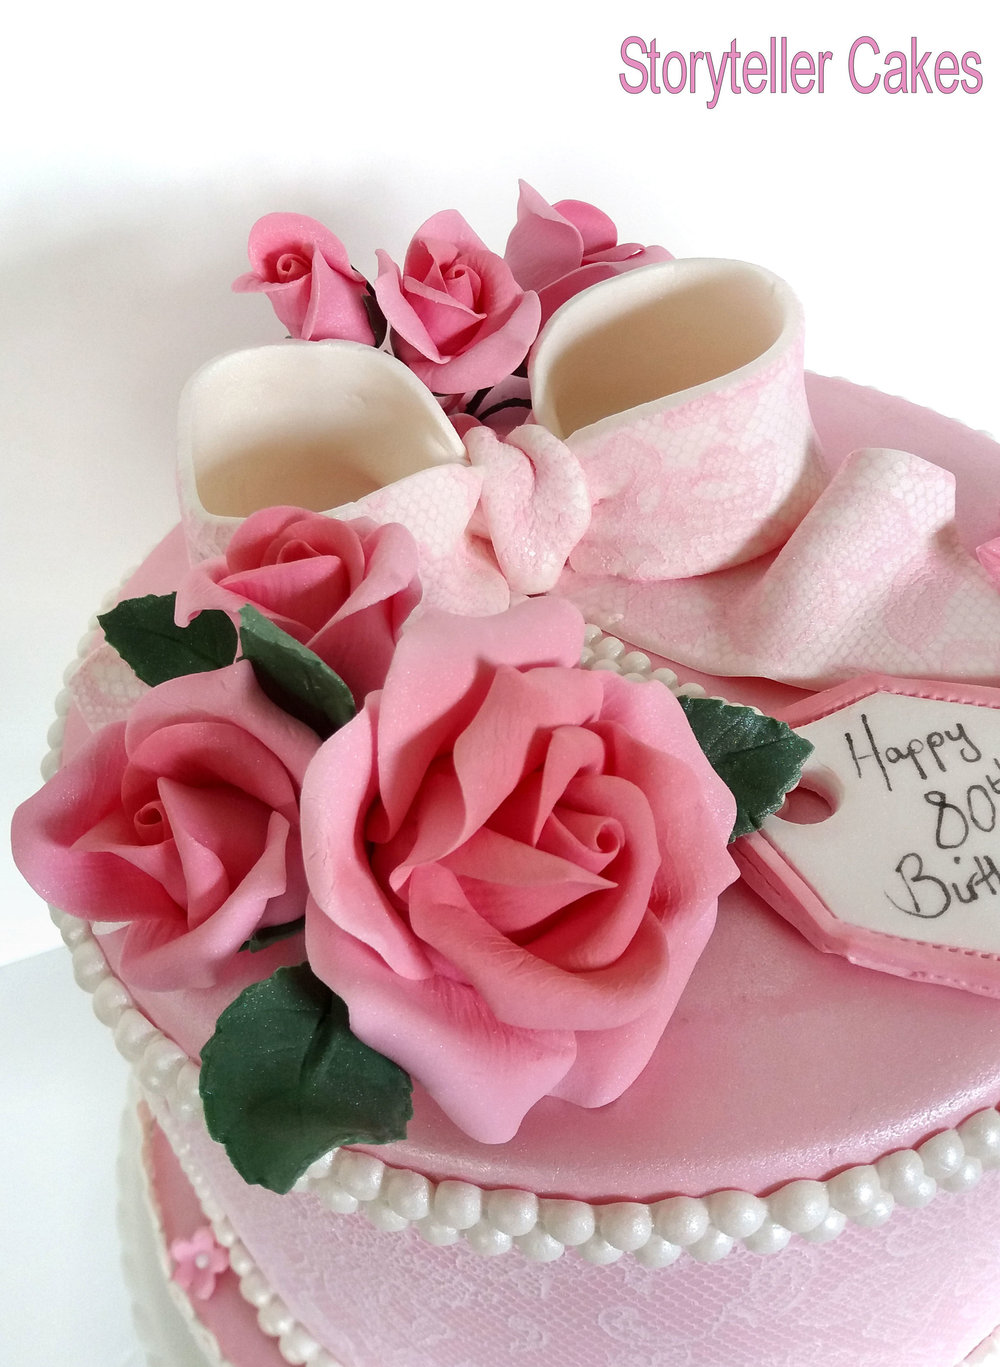 rose cake 4.jpg